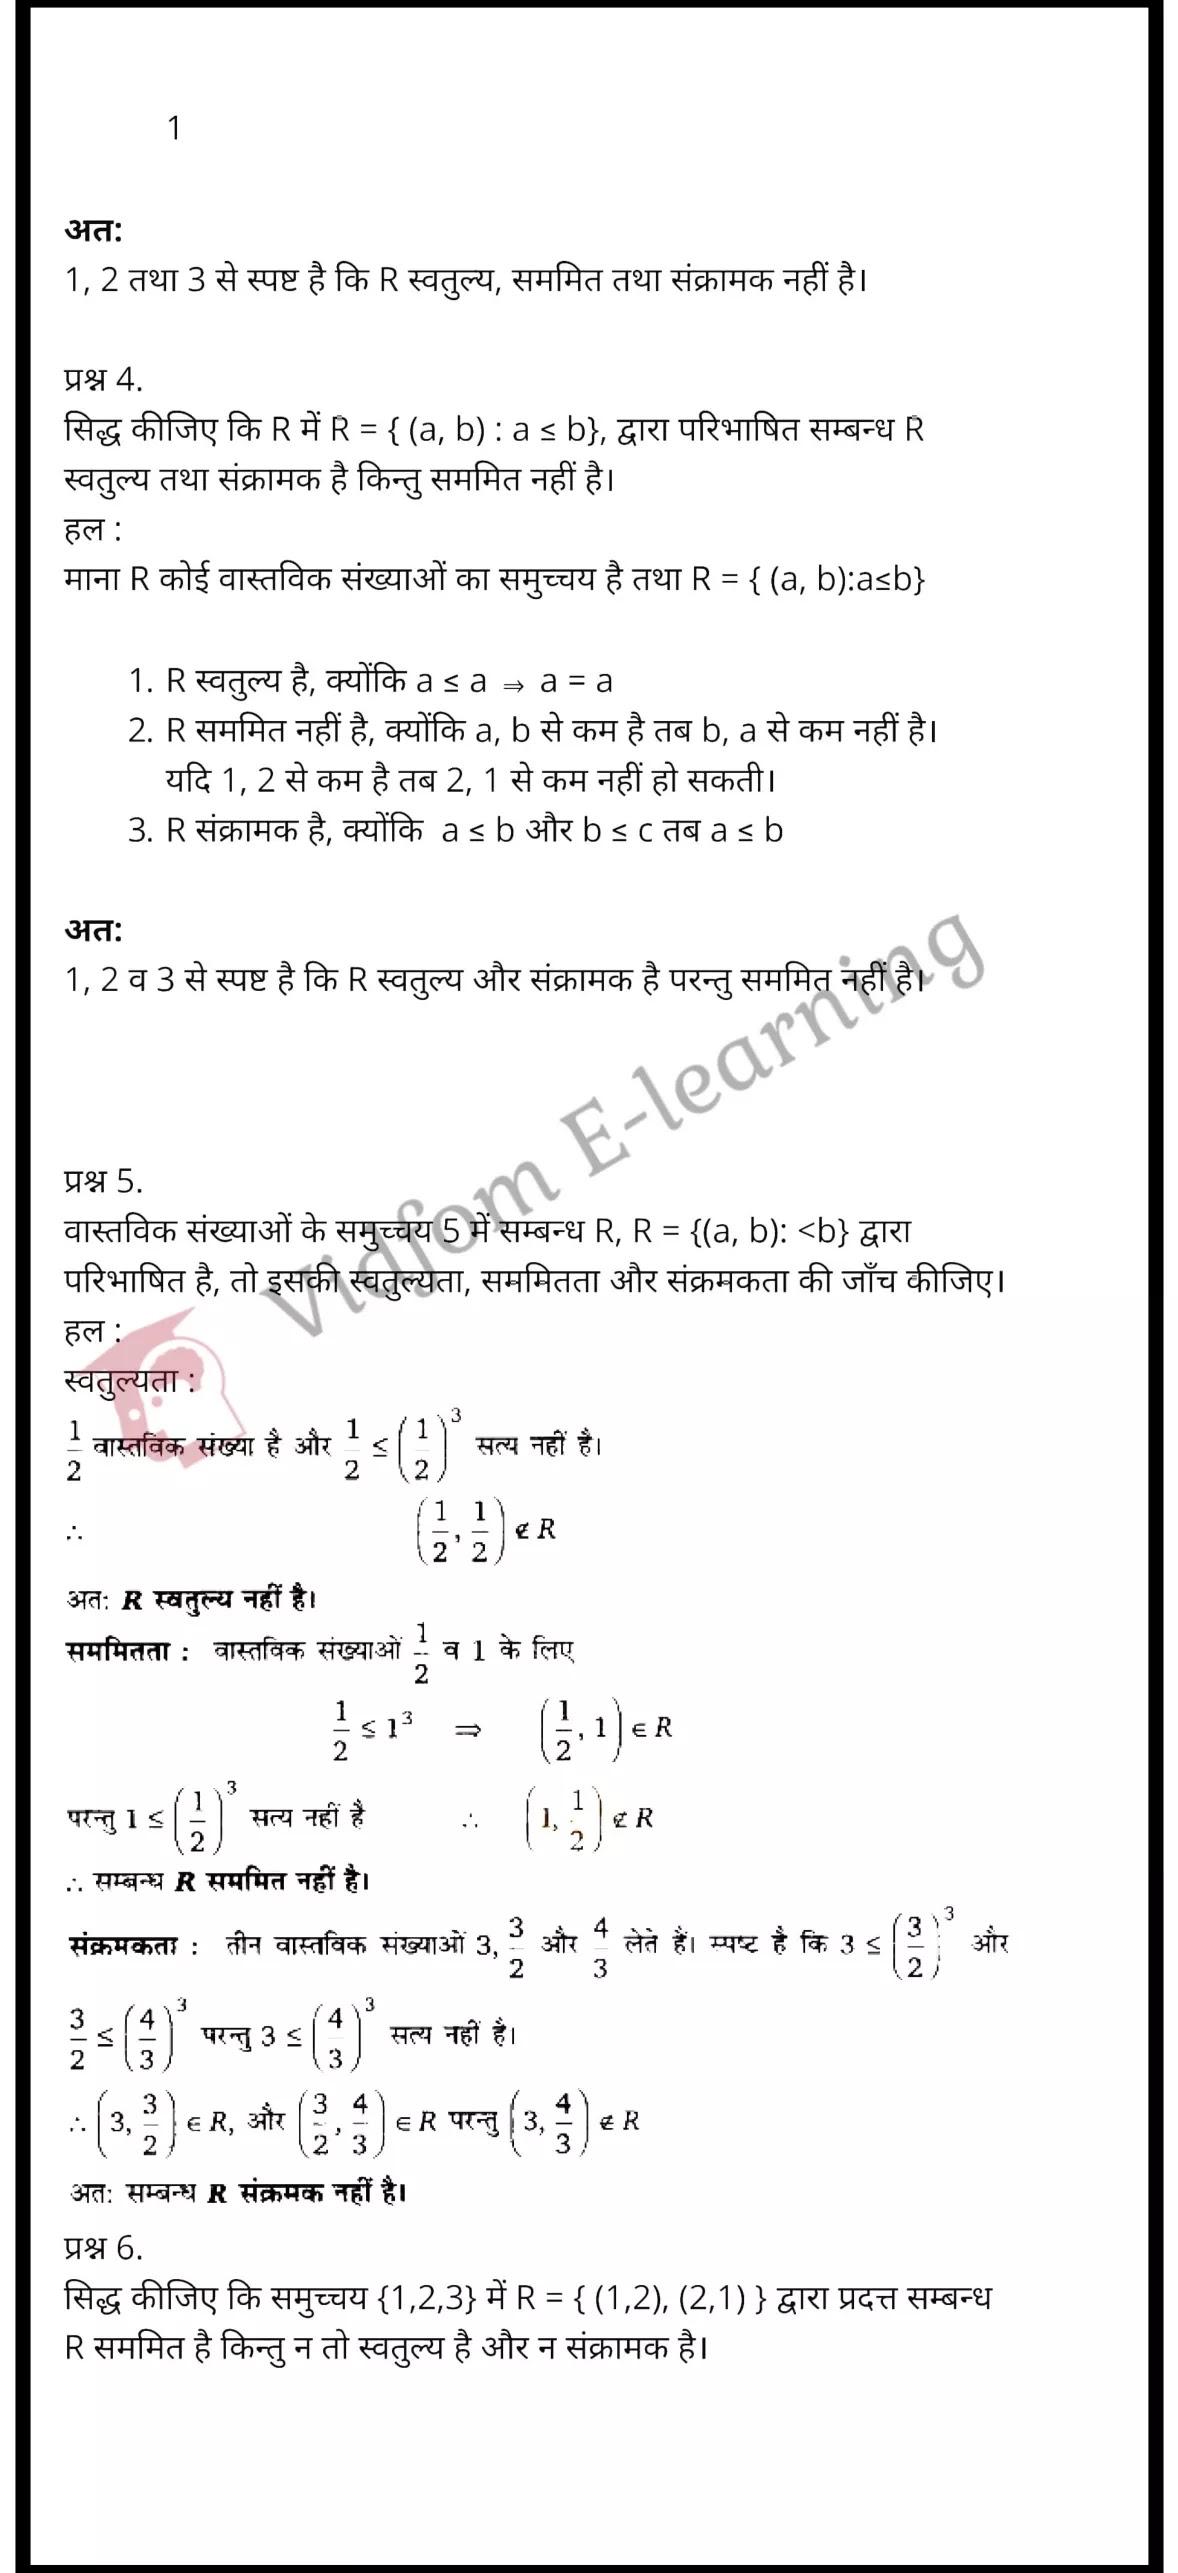 कक्षा 12 गणित  के नोट्स  हिंदी में एनसीईआरटी समाधान,     class 12 Maths Chapter 1,   class 12 Maths Chapter 1 ncert solutions in Hindi,   class 12 Maths Chapter 1 notes in hindi,   class 12 Maths Chapter 1 question answer,   class 12 Maths Chapter 1 notes,   class 12 Maths Chapter 1 class 12 Maths Chapter 1 in  hindi,    class 12 Maths Chapter 1 important questions in  hindi,   class 12 Maths Chapter 1 notes in hindi,    class 12 Maths Chapter 1 test,   class 12 Maths Chapter 1 pdf,   class 12 Maths Chapter 1 notes pdf,   class 12 Maths Chapter 1 exercise solutions,   class 12 Maths Chapter 1 notes study rankers,   class 12 Maths Chapter 1 notes,    class 12 Maths Chapter 1  class 12  notes pdf,   class 12 Maths Chapter 1 class 12  notes  ncert,   class 12 Maths Chapter 1 class 12 pdf,   class 12 Maths Chapter 1  book,   class 12 Maths Chapter 1 quiz class 12  ,    10  th class 12 Maths Chapter 1  book up board,   up board 10  th class 12 Maths Chapter 1 notes,  class 12 Maths,   class 12 Maths ncert solutions in Hindi,   class 12 Maths notes in hindi,   class 12 Maths question answer,   class 12 Maths notes,  class 12 Maths class 12 Maths Chapter 1 in  hindi,    class 12 Maths important questions in  hindi,   class 12 Maths notes in hindi,    class 12 Maths test,  class 12 Maths class 12 Maths Chapter 1 pdf,   class 12 Maths notes pdf,   class 12 Maths exercise solutions,   class 12 Maths,  class 12 Maths notes study rankers,   class 12 Maths notes,  class 12 Maths notes,   class 12 Maths  class 12  notes pdf,   class 12 Maths class 12  notes  ncert,   class 12 Maths class 12 pdf,   class 12 Maths  book,  class 12 Maths quiz class 12  ,  10  th class 12 Maths    book up board,    up board 10  th class 12 Maths notes,      कक्षा 12 गणित अध्याय 1 ,  कक्षा 12 गणित, कक्षा 12 गणित अध्याय 1  के नोट्स हिंदी में,  कक्षा 12 का हिंदी अध्याय 1 का प्रश्न उत्तर,  कक्षा 12 गणित अध्याय 1 के नोट्स,  10 कक्षा गणित  हिंदी में, कक्षा 12 गणित अध्याय 1  हिंदी में,  कक्षा 12 गणित अध्याय